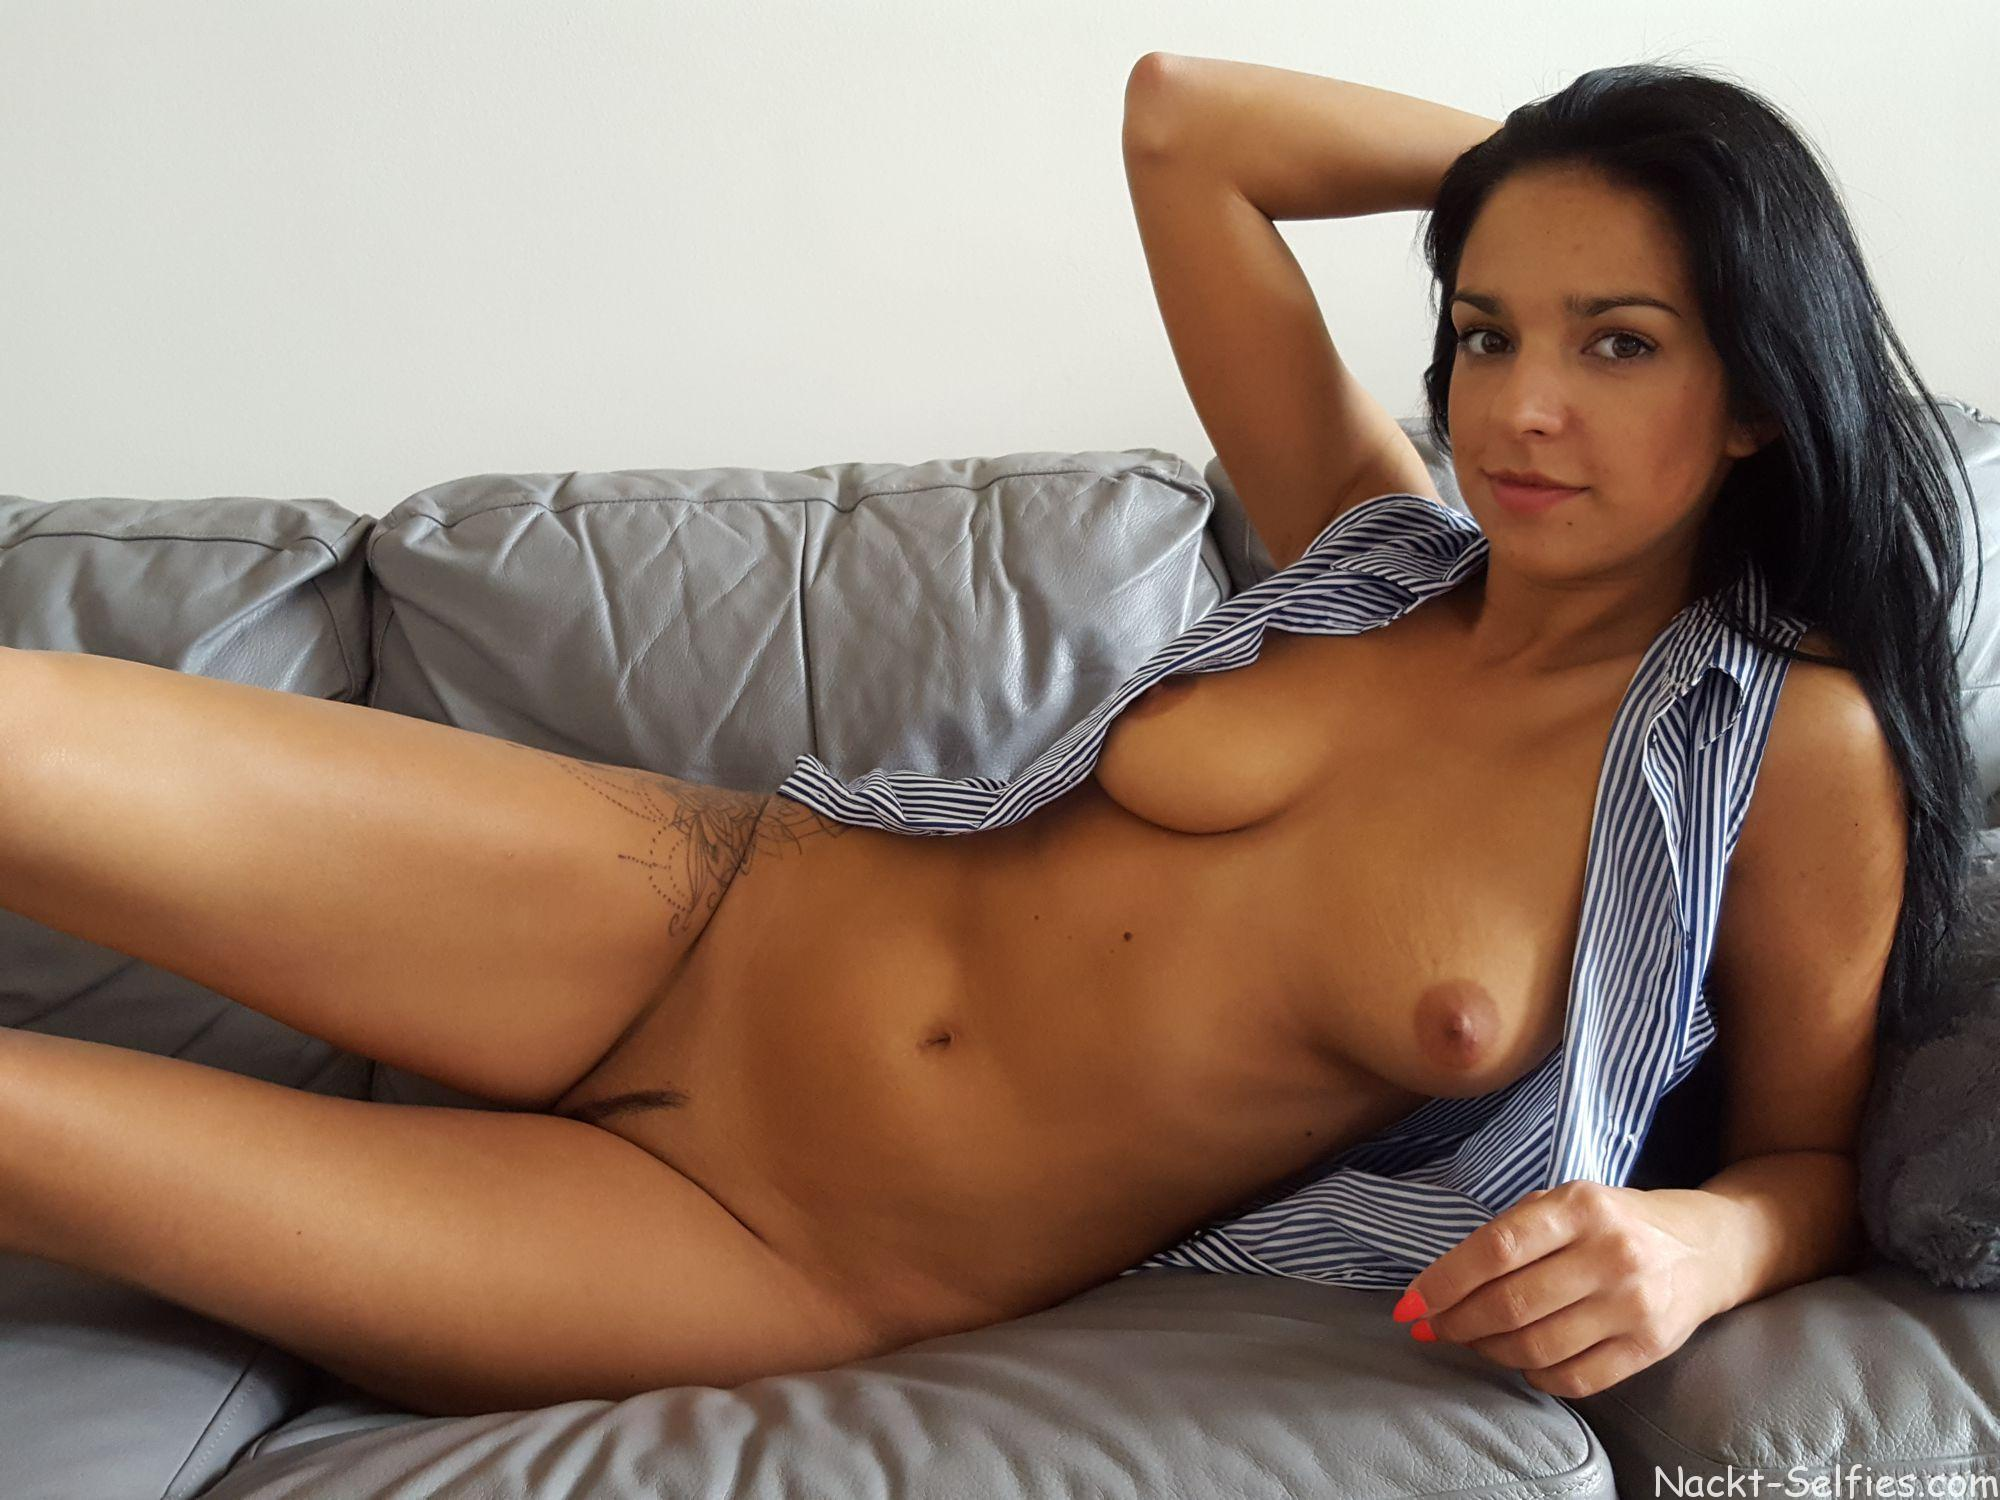 Privates Nacktbild Angelique nackt-selfies.com 01